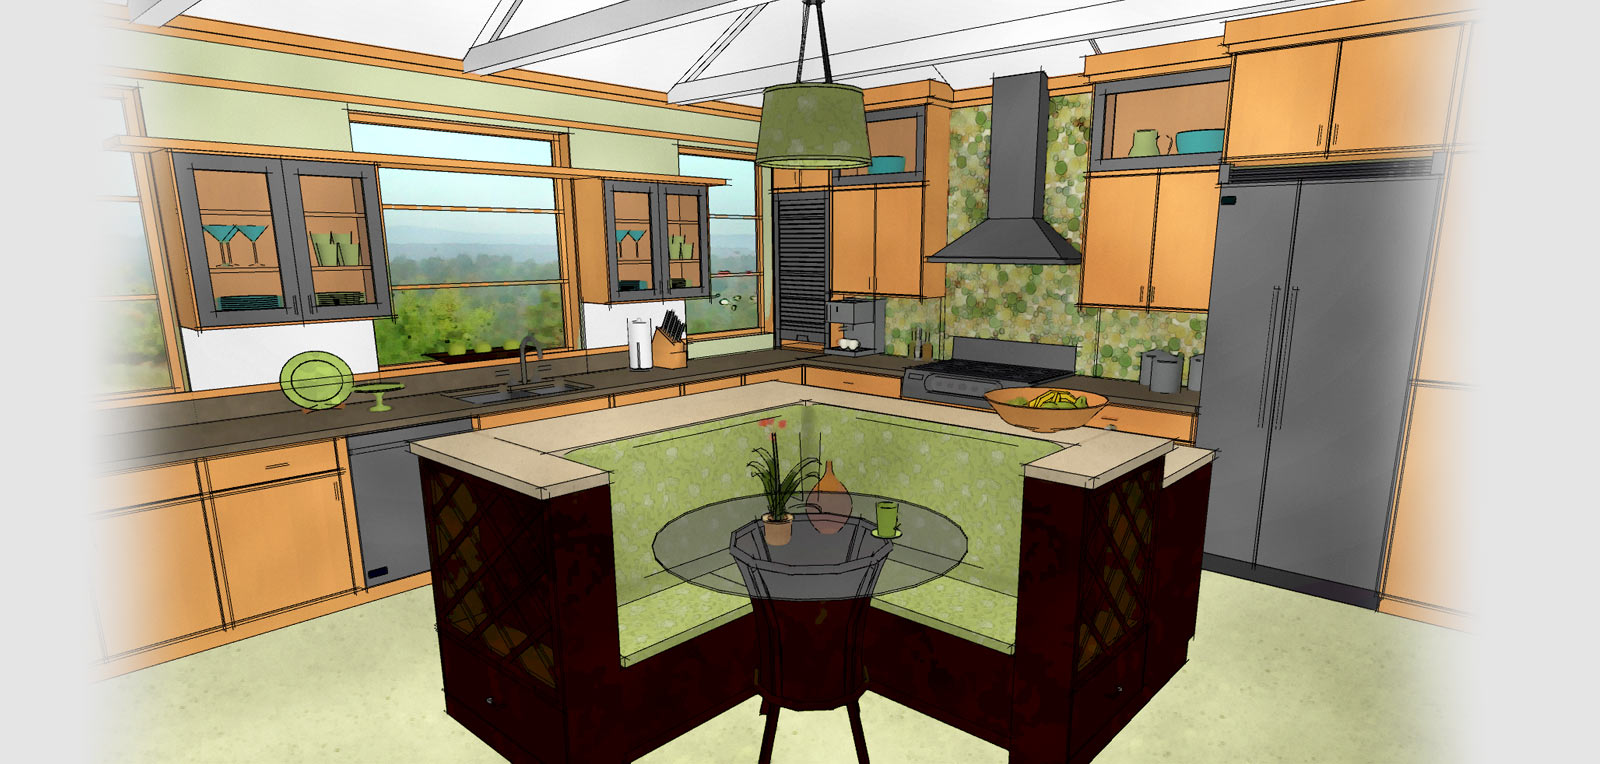 Furniture Interior Design Software Free Download ~ Kitchen furniture and interior design software free download